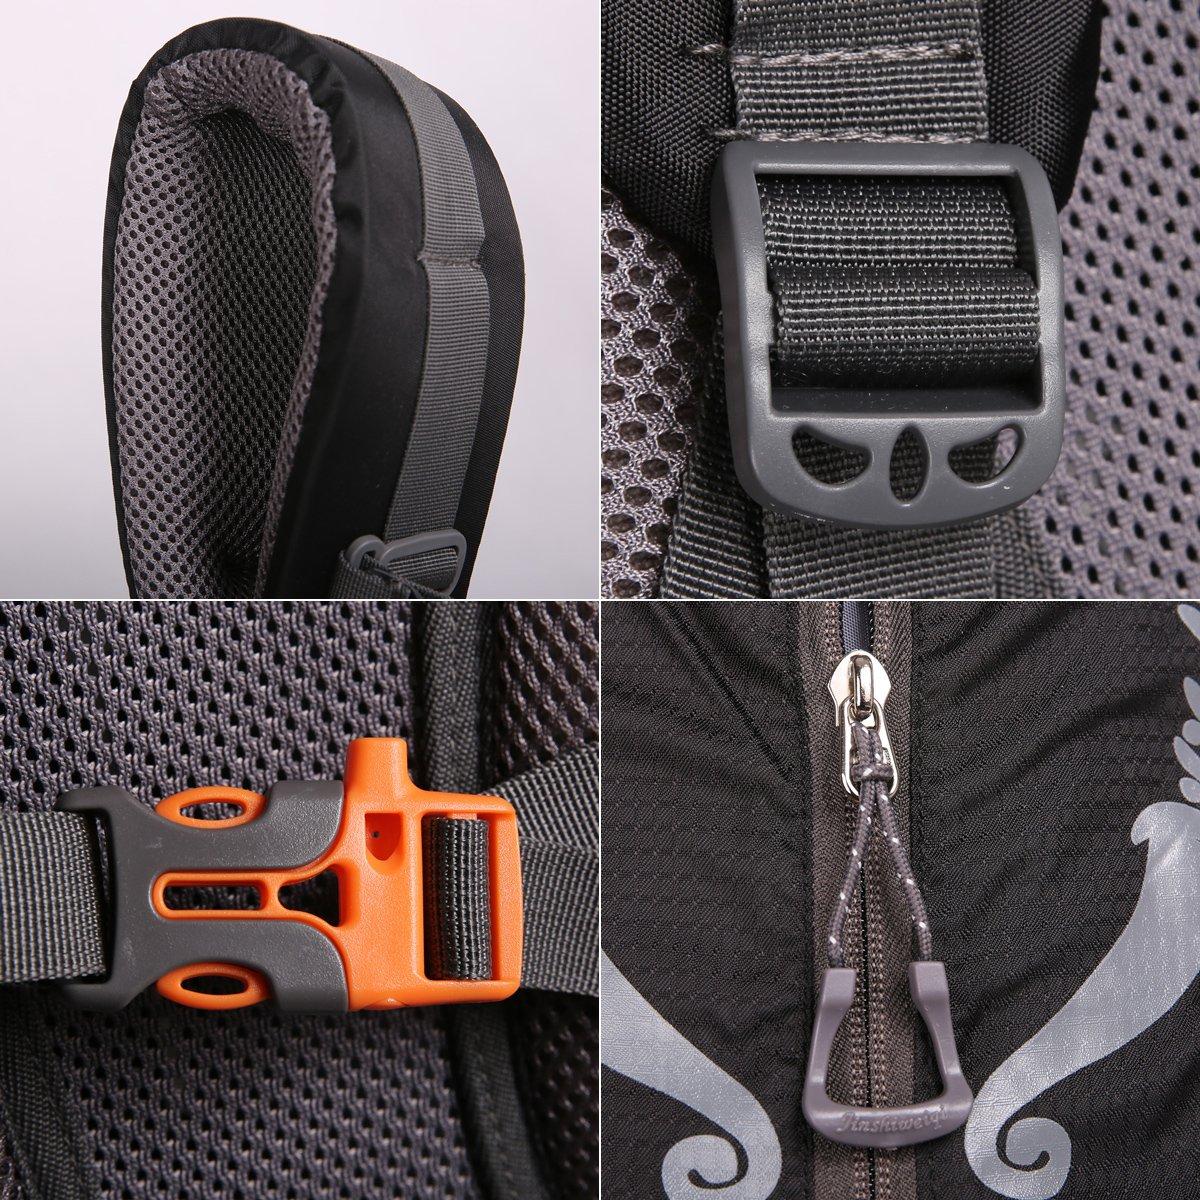 HWJIANFENG Backpack for Outdoor Sports Hiking Traveling Trekking Camping Waterproof Mountaineering Ultralarge Capacity Internal Frame Men Women 80L+5L